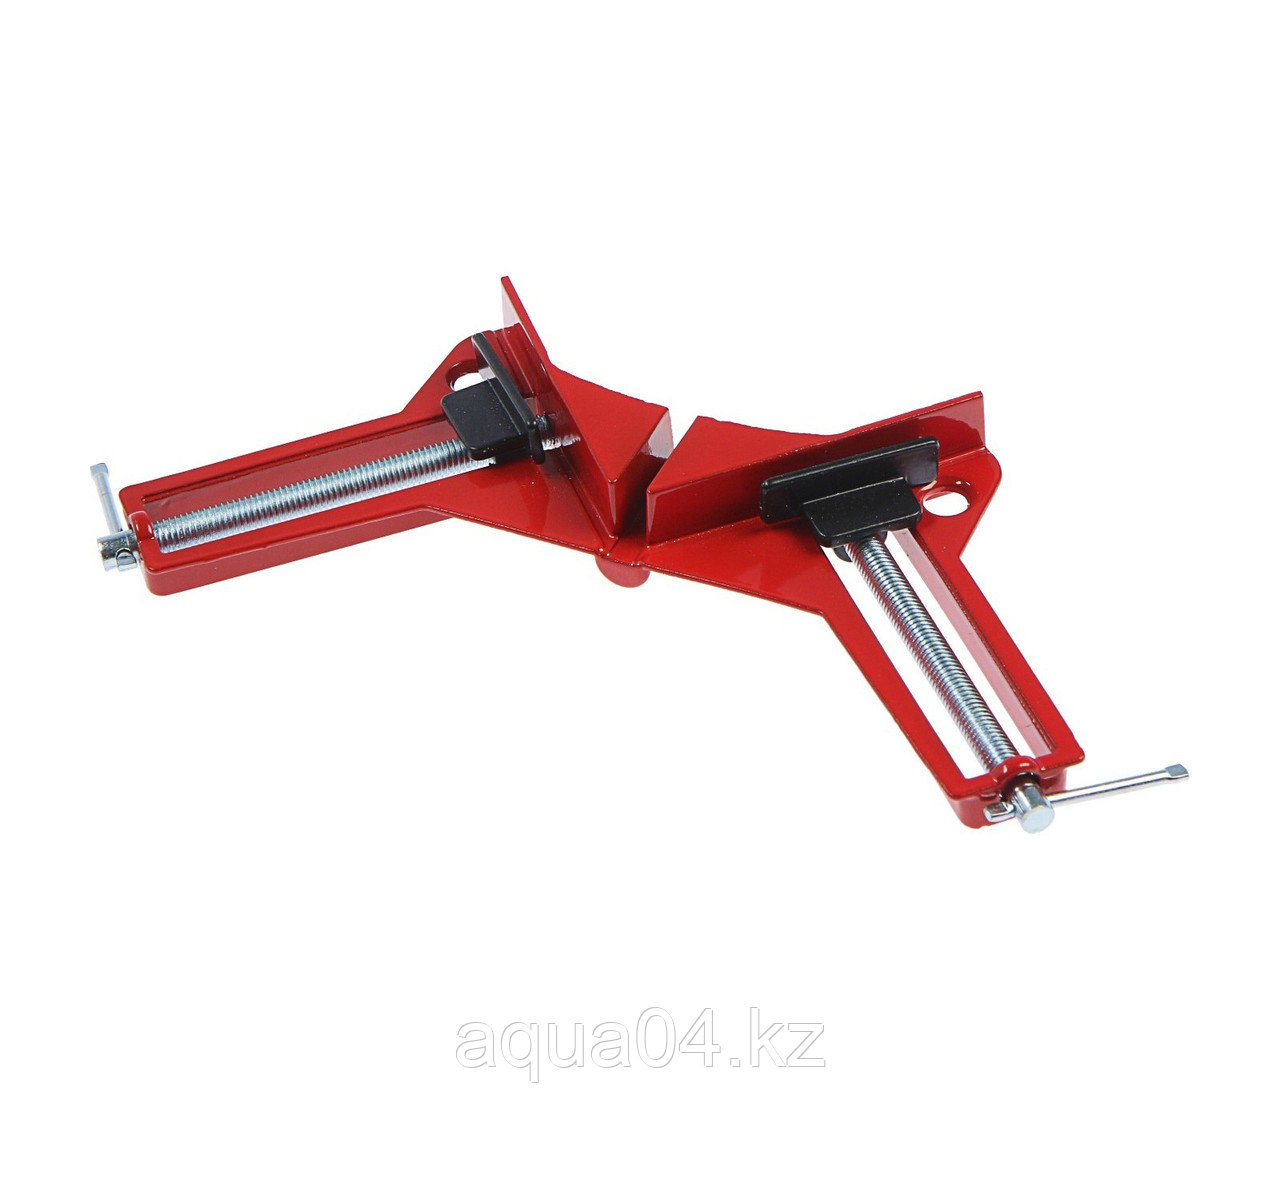 Струбцина угловая Top Tools 75 x 75 мм